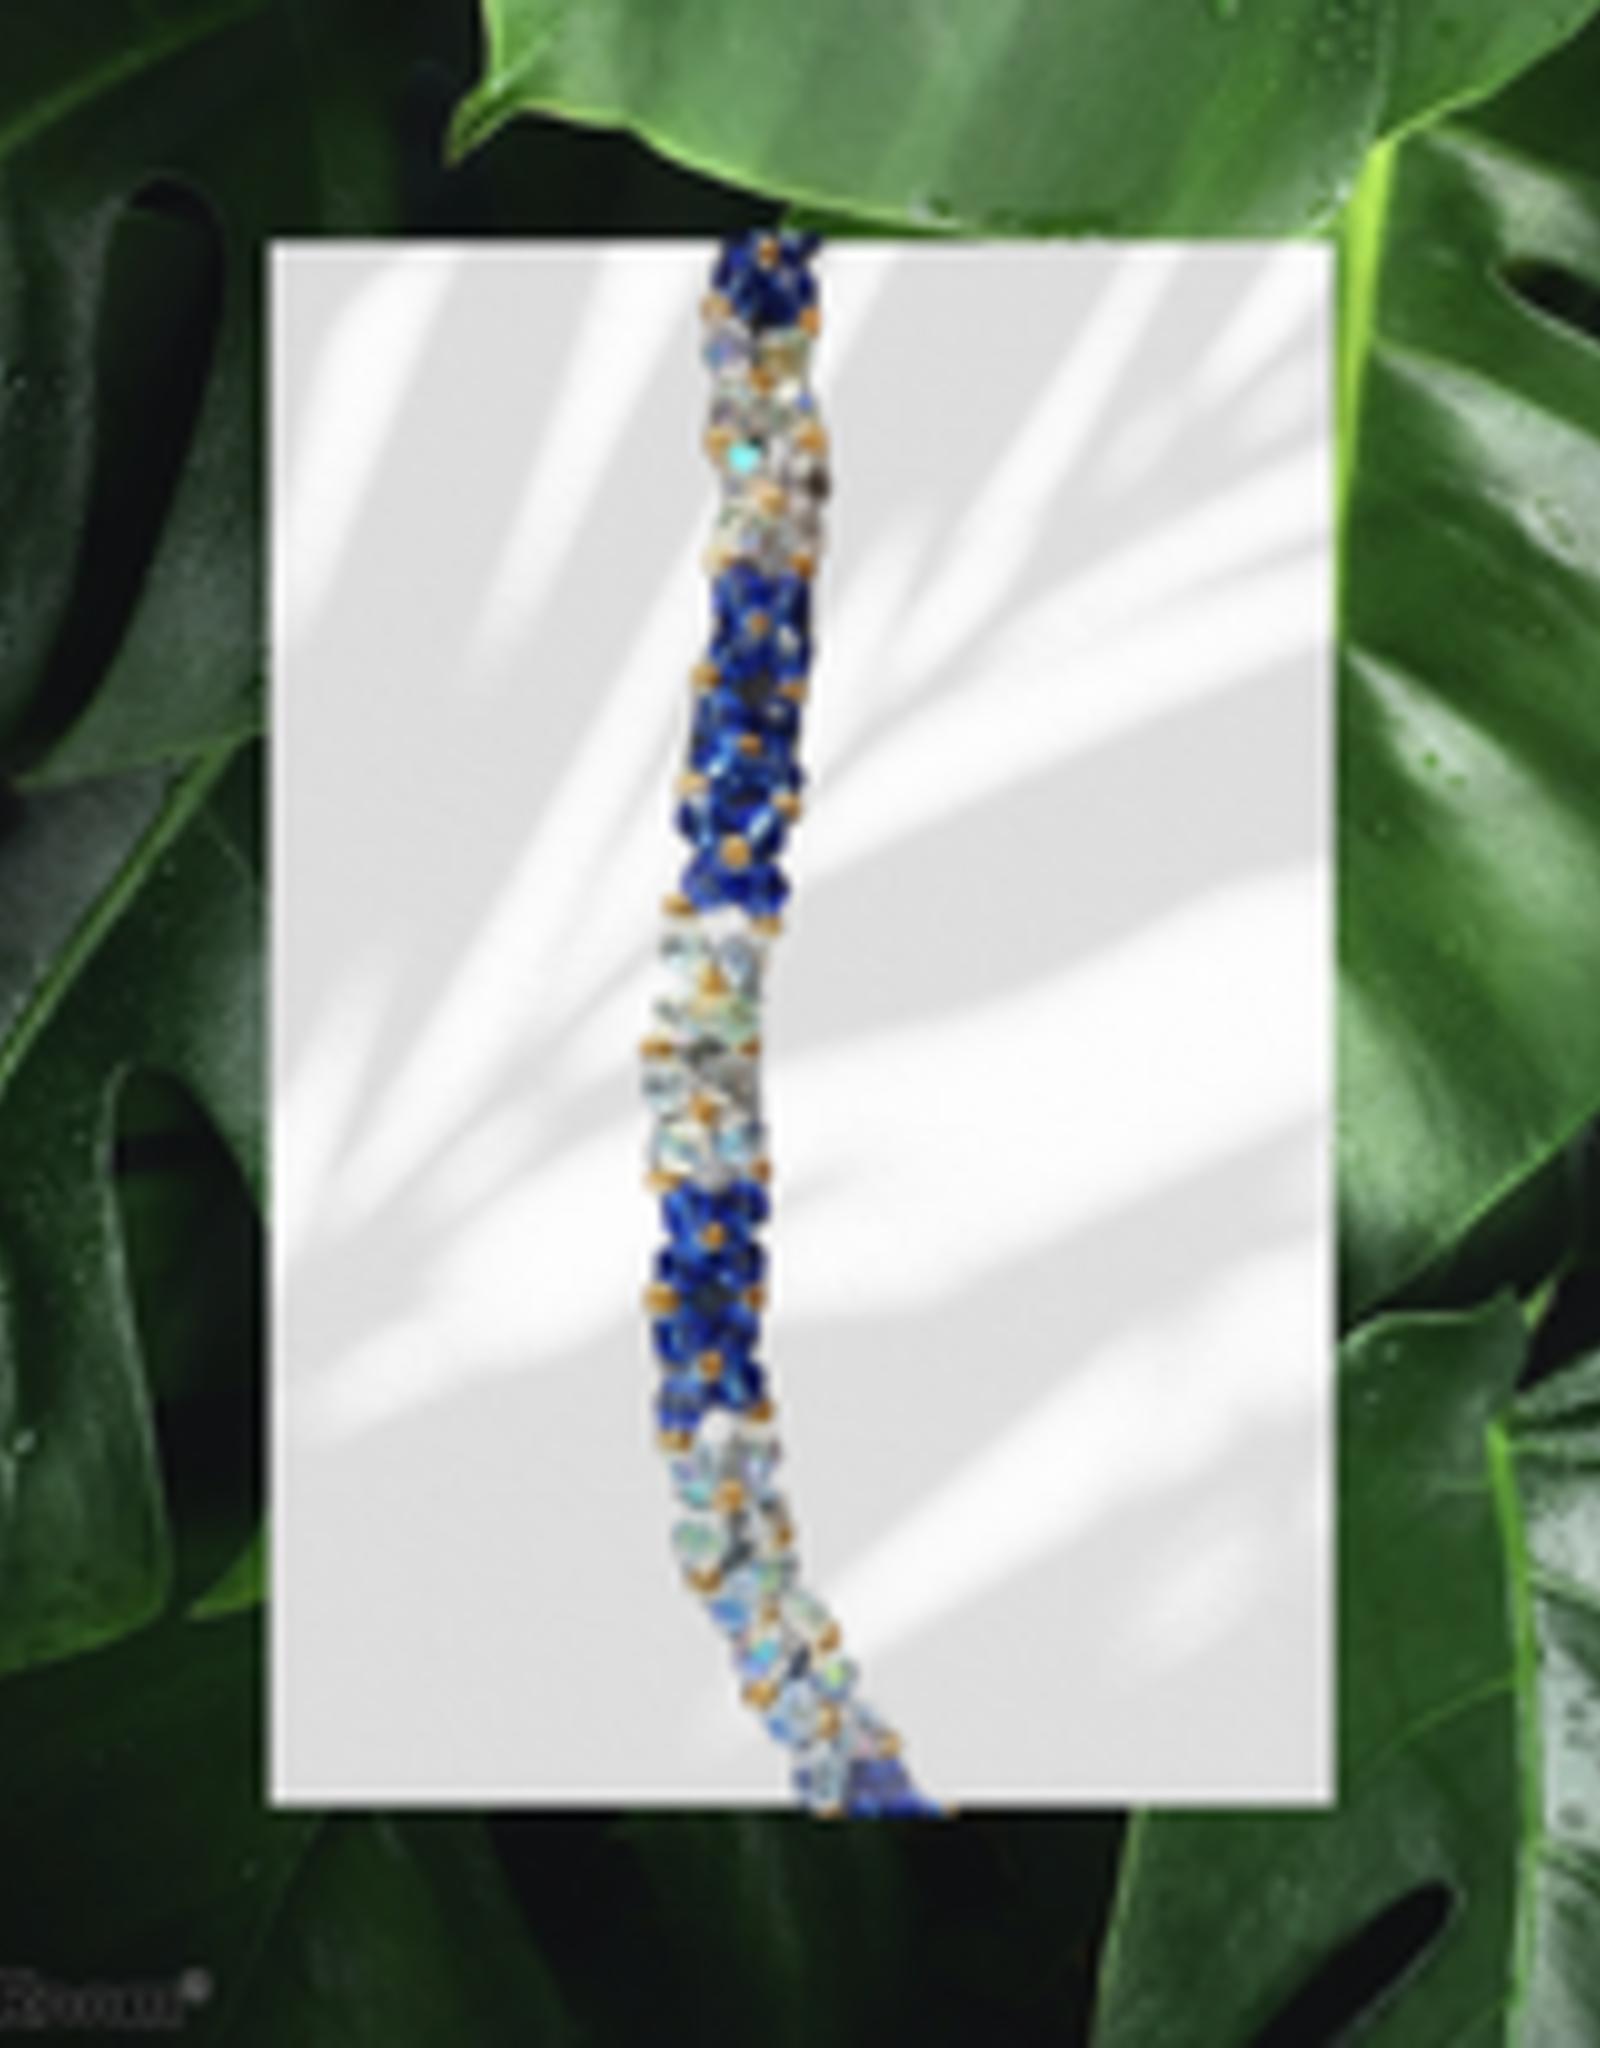 seazido - wevyra swarovski ketting Blauw bloem vormig